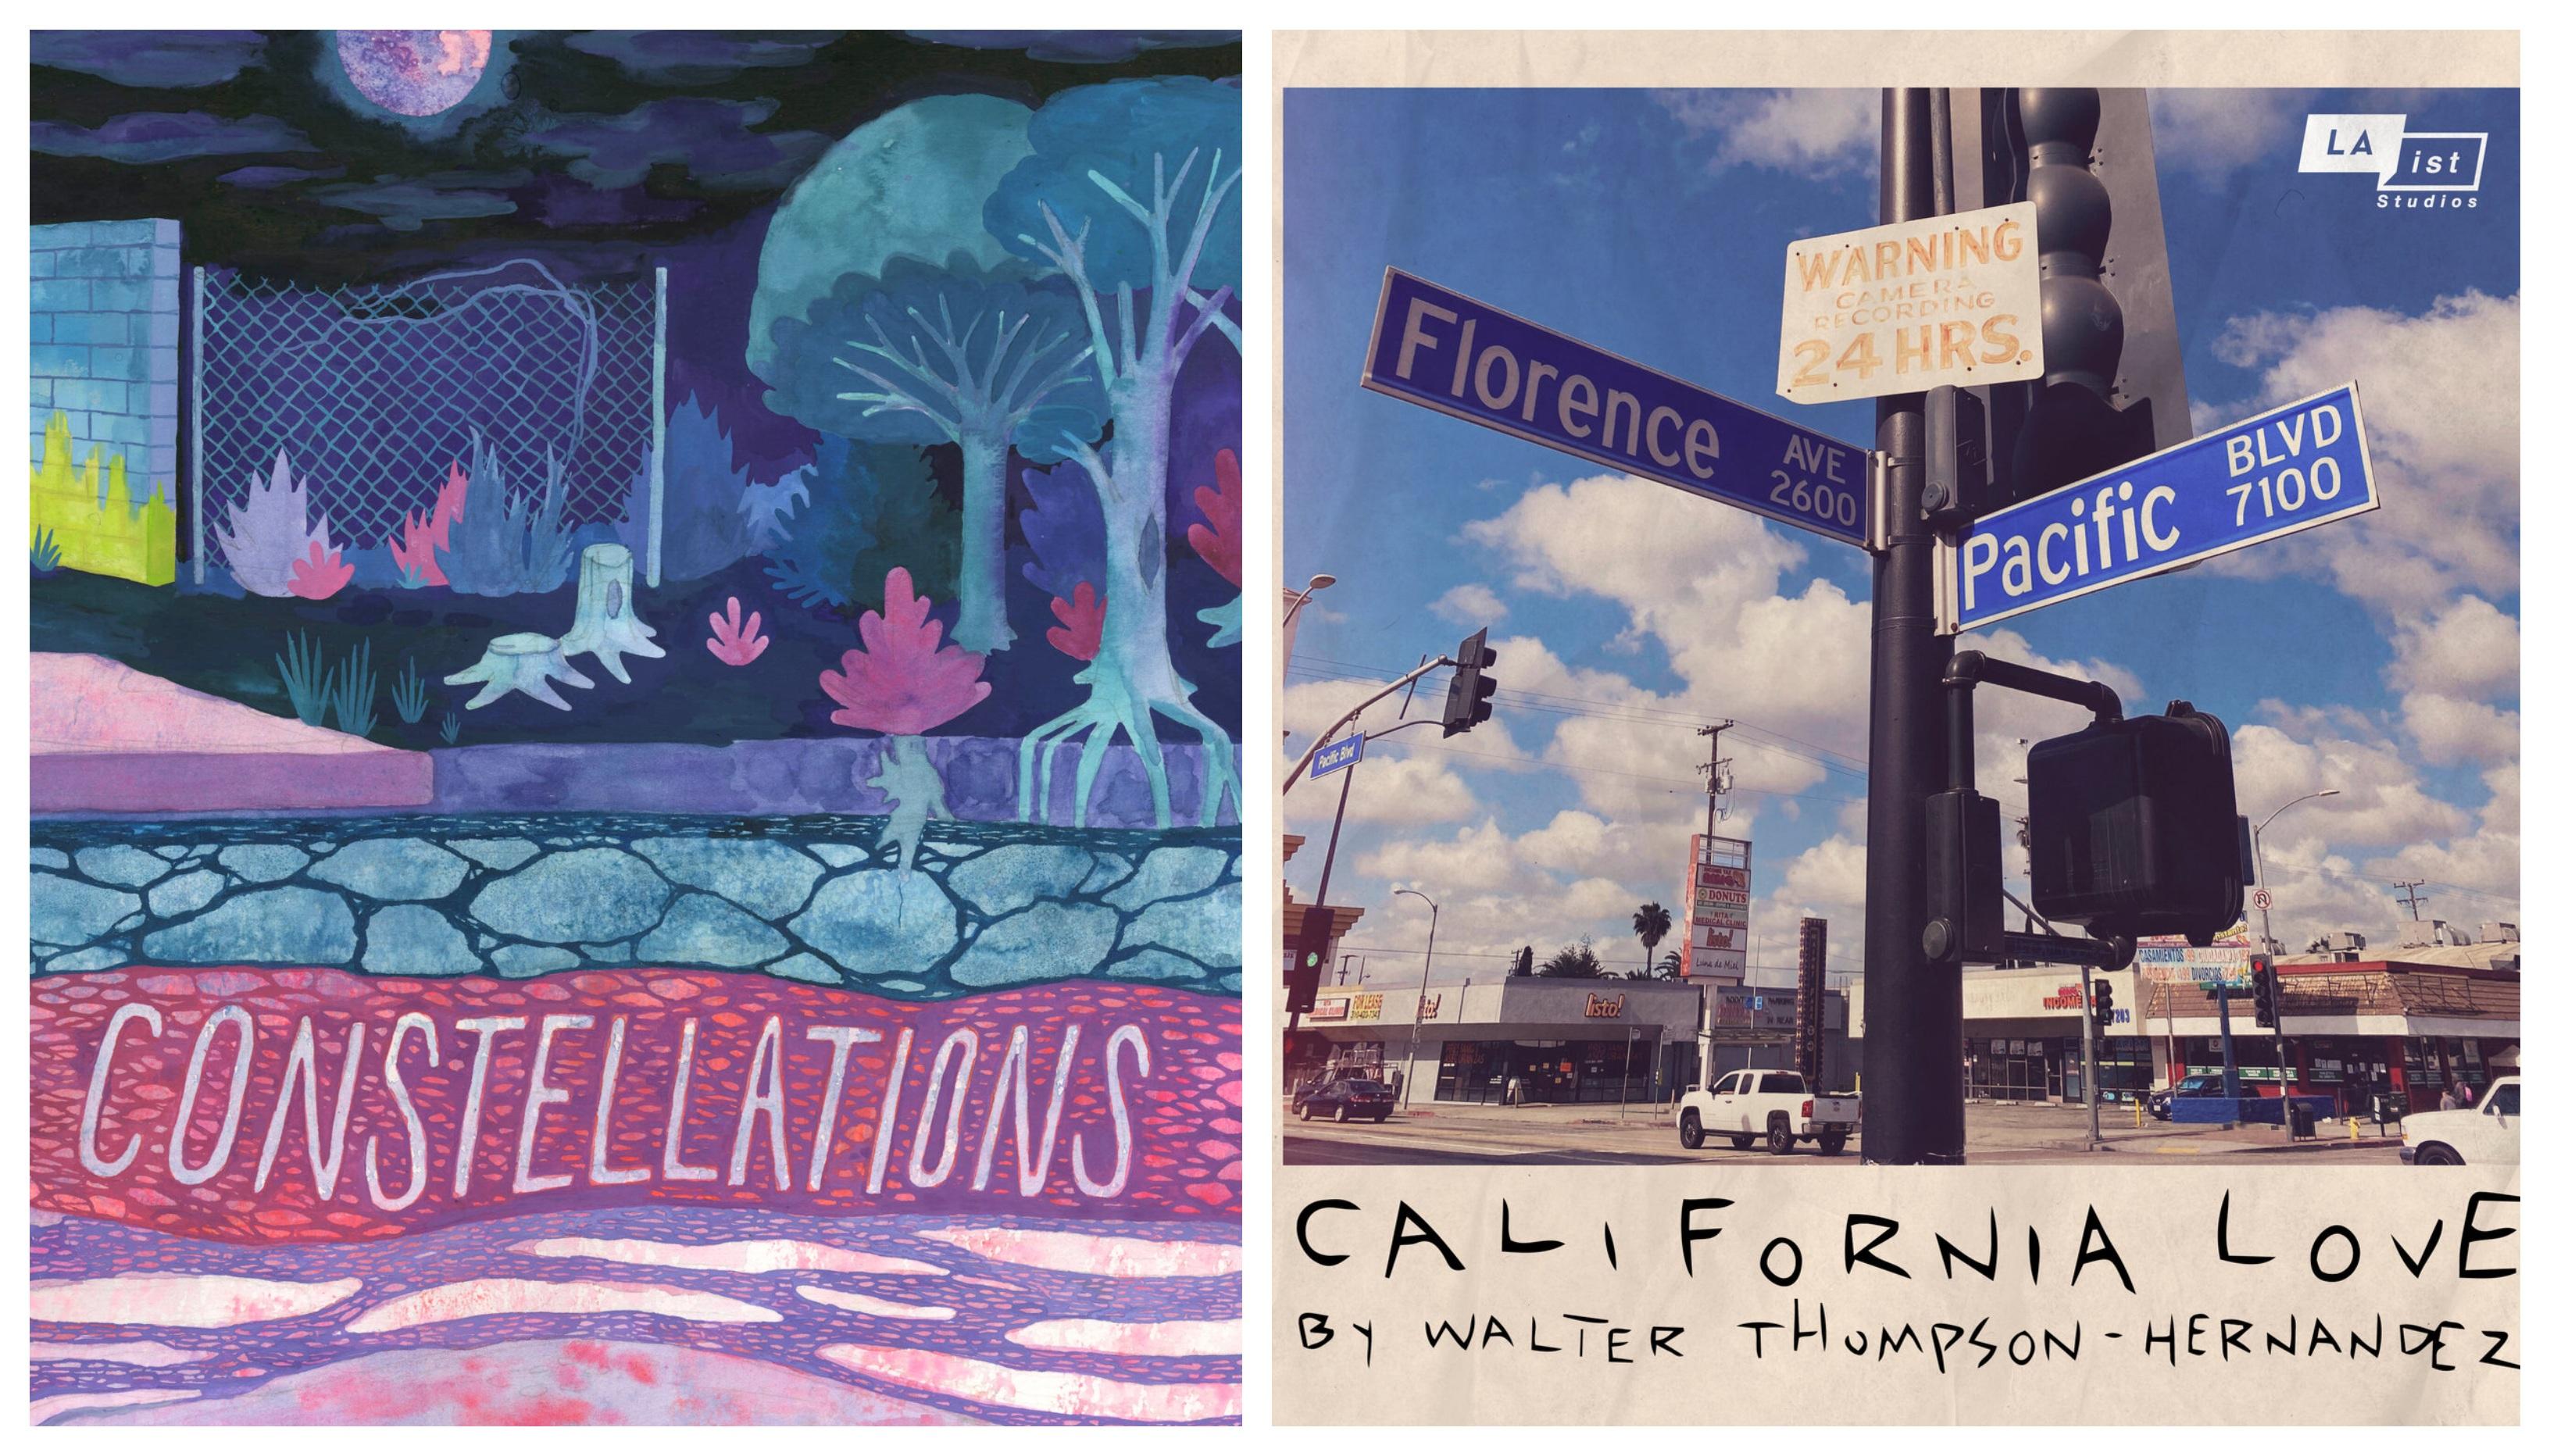 Constellations - California Love